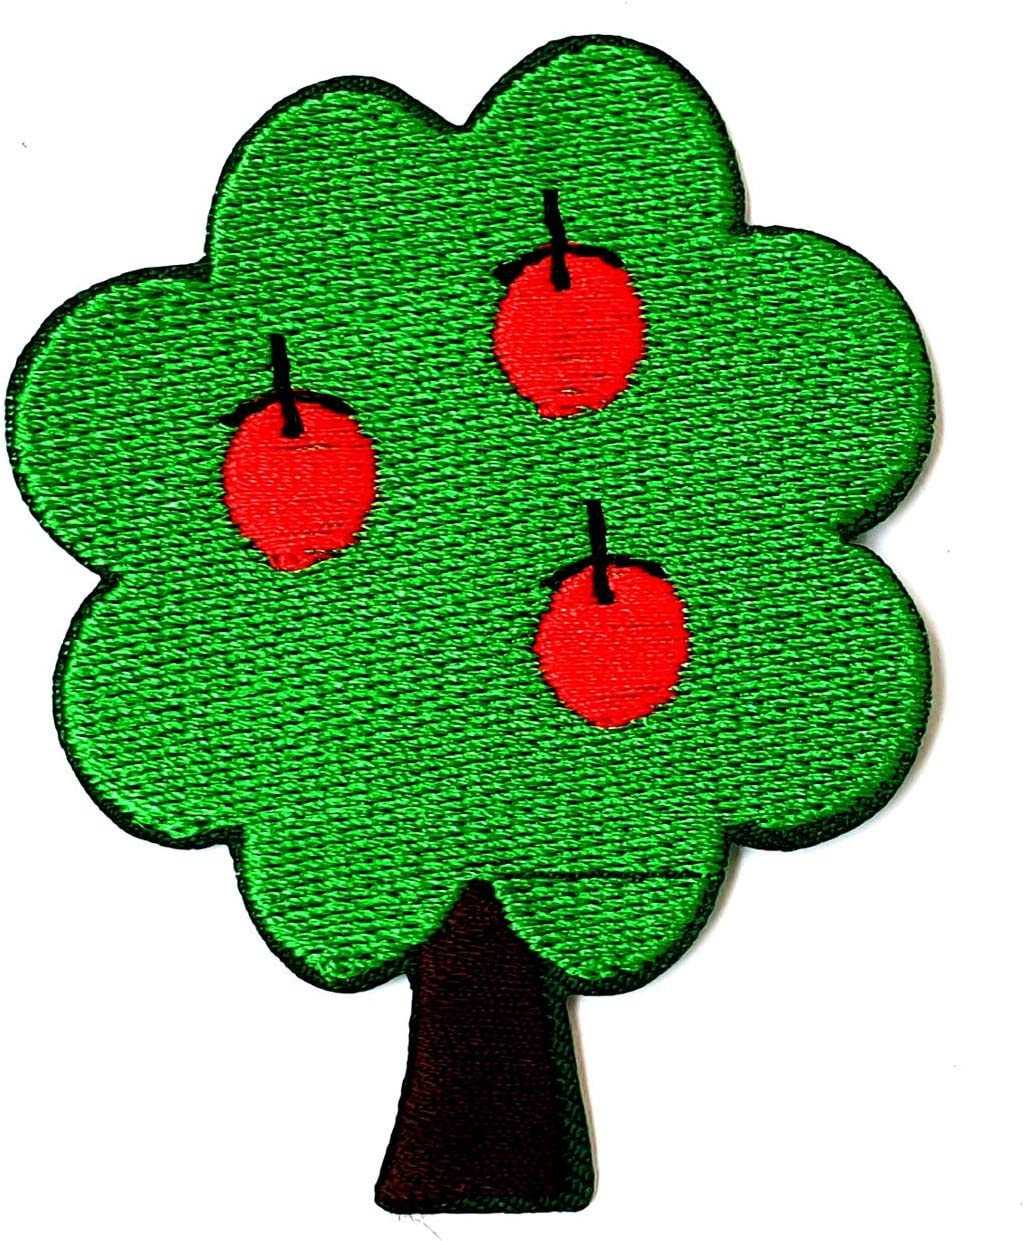 Apple Tree Red Apple Fruit Summer Garden Nature Cartoon Children Kid Patch Clothes Bag T-Shirt Jeans Biker Badge Applique Iron on/Sew On Patch